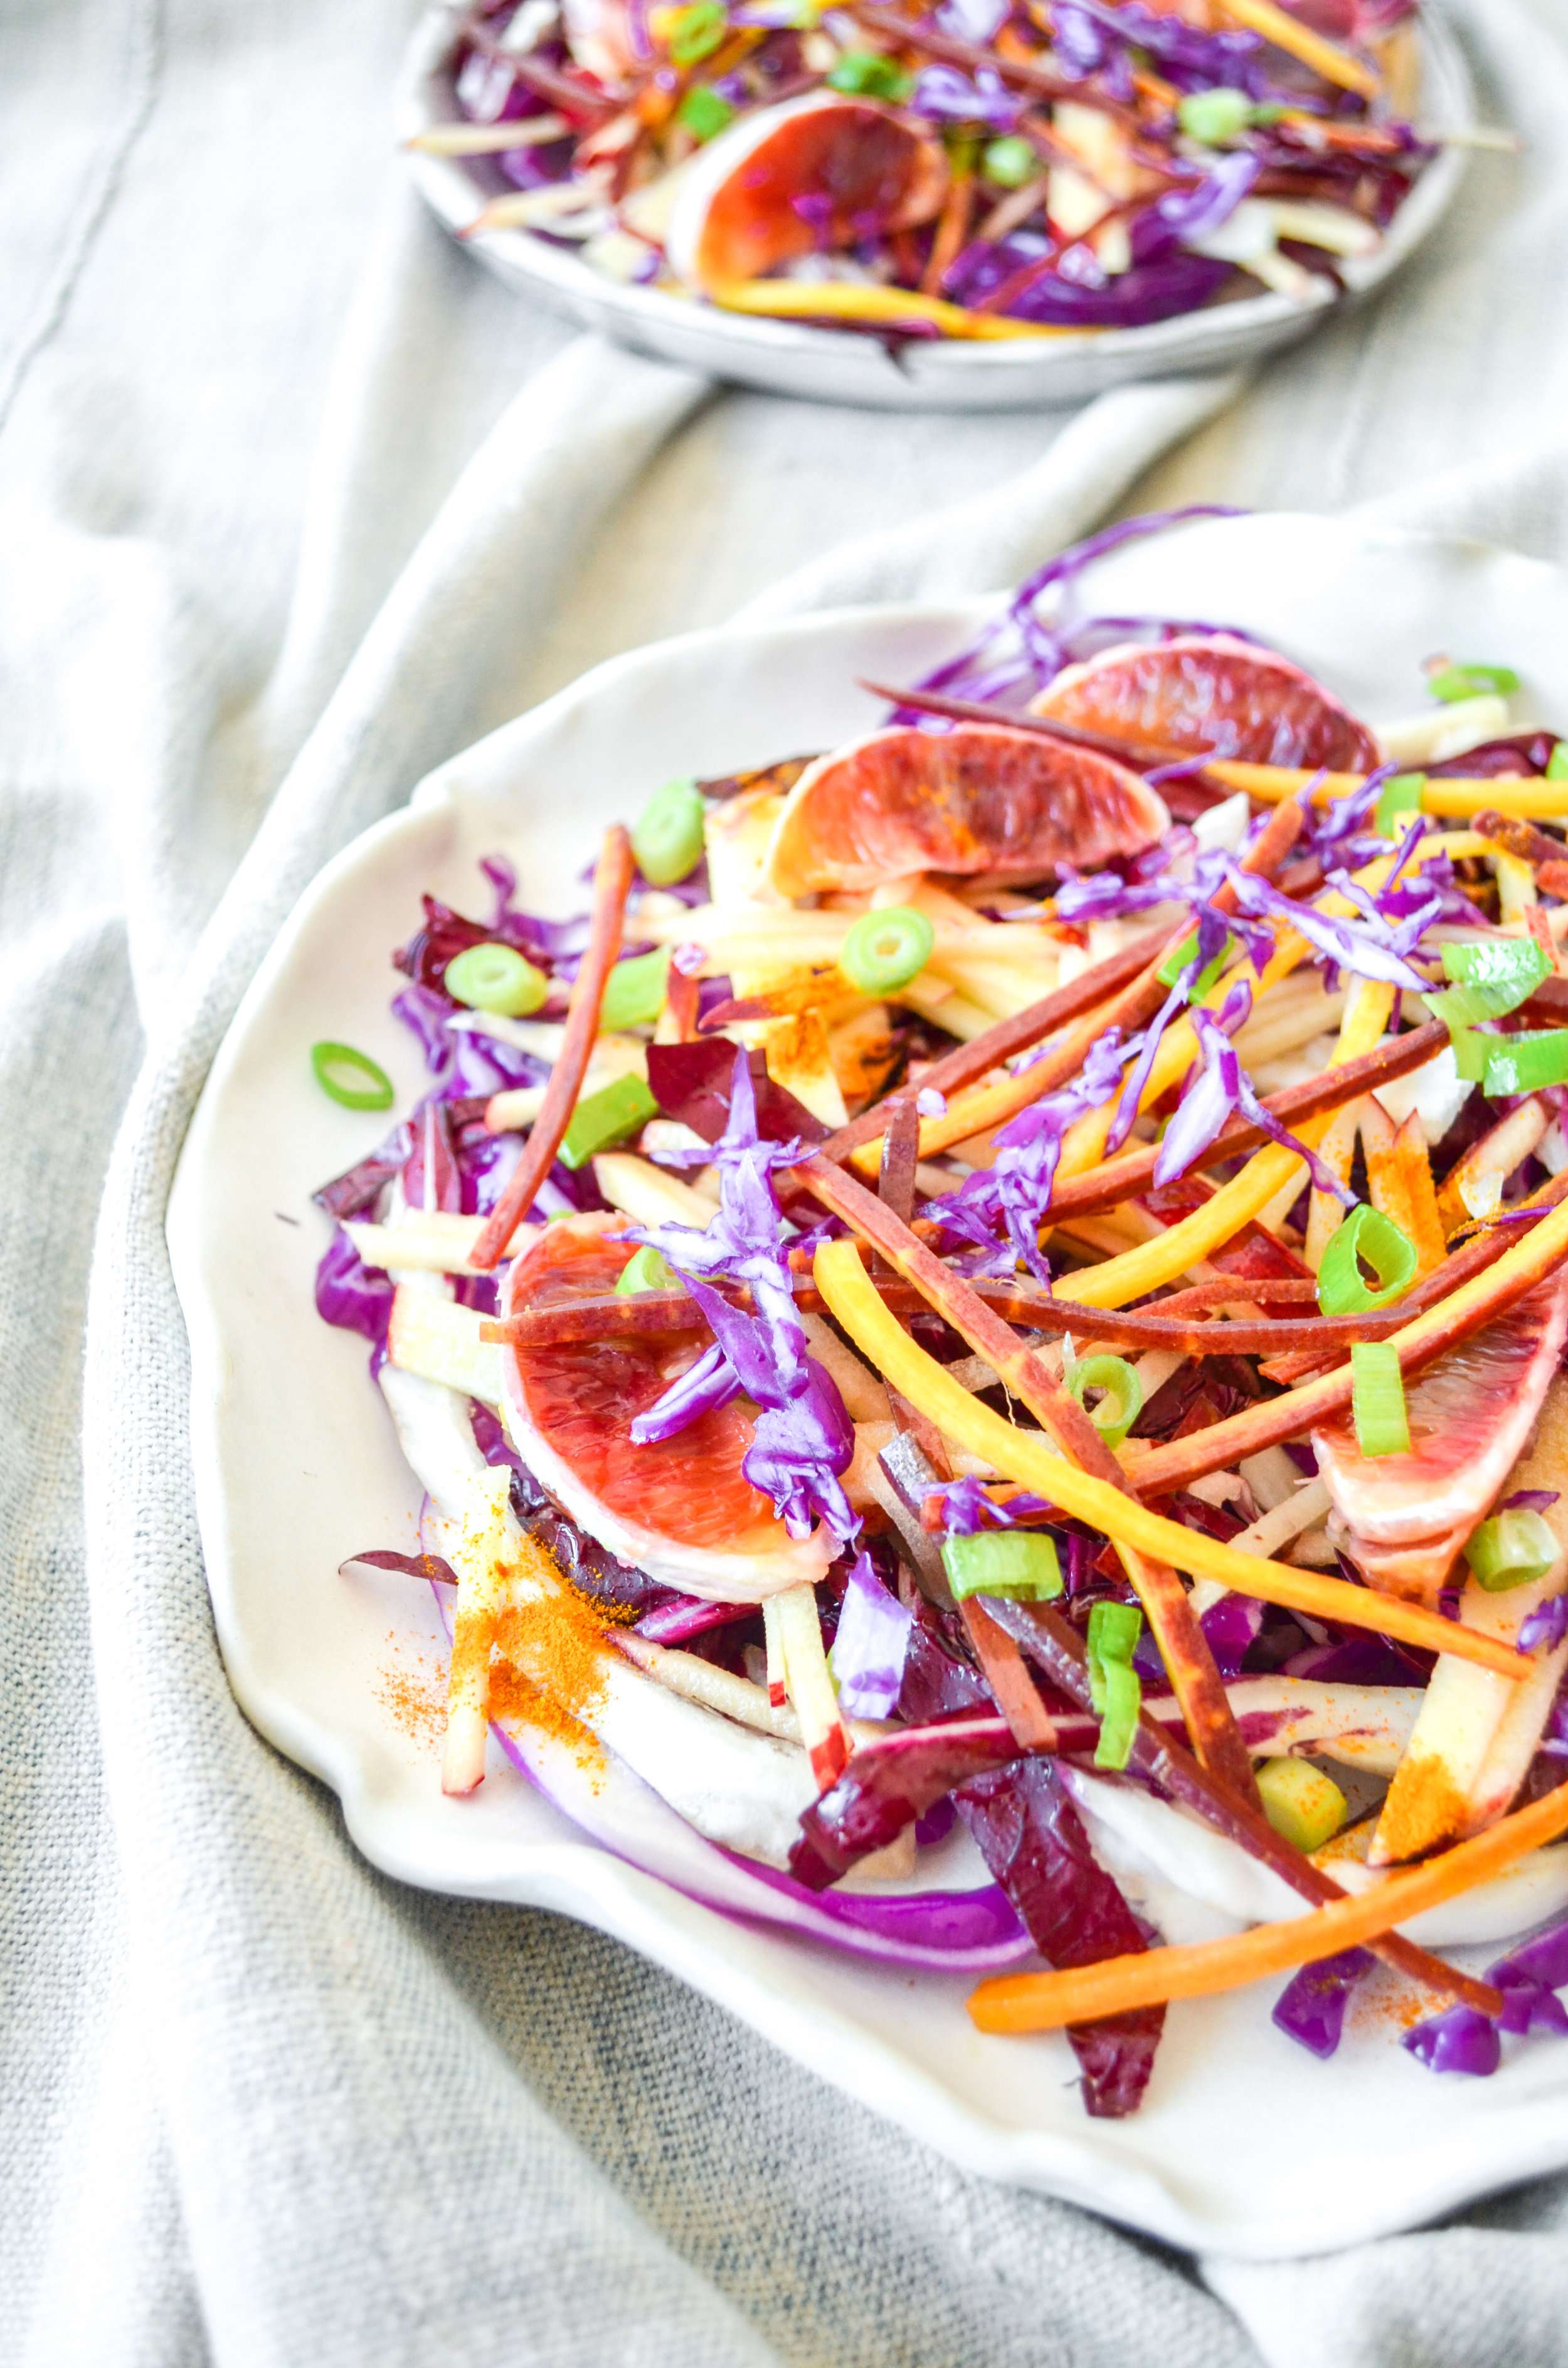 brussels-sprouts-salad-ShiraRD-paleo-refinedsugarfree-SnacksbyShira-1.jpg